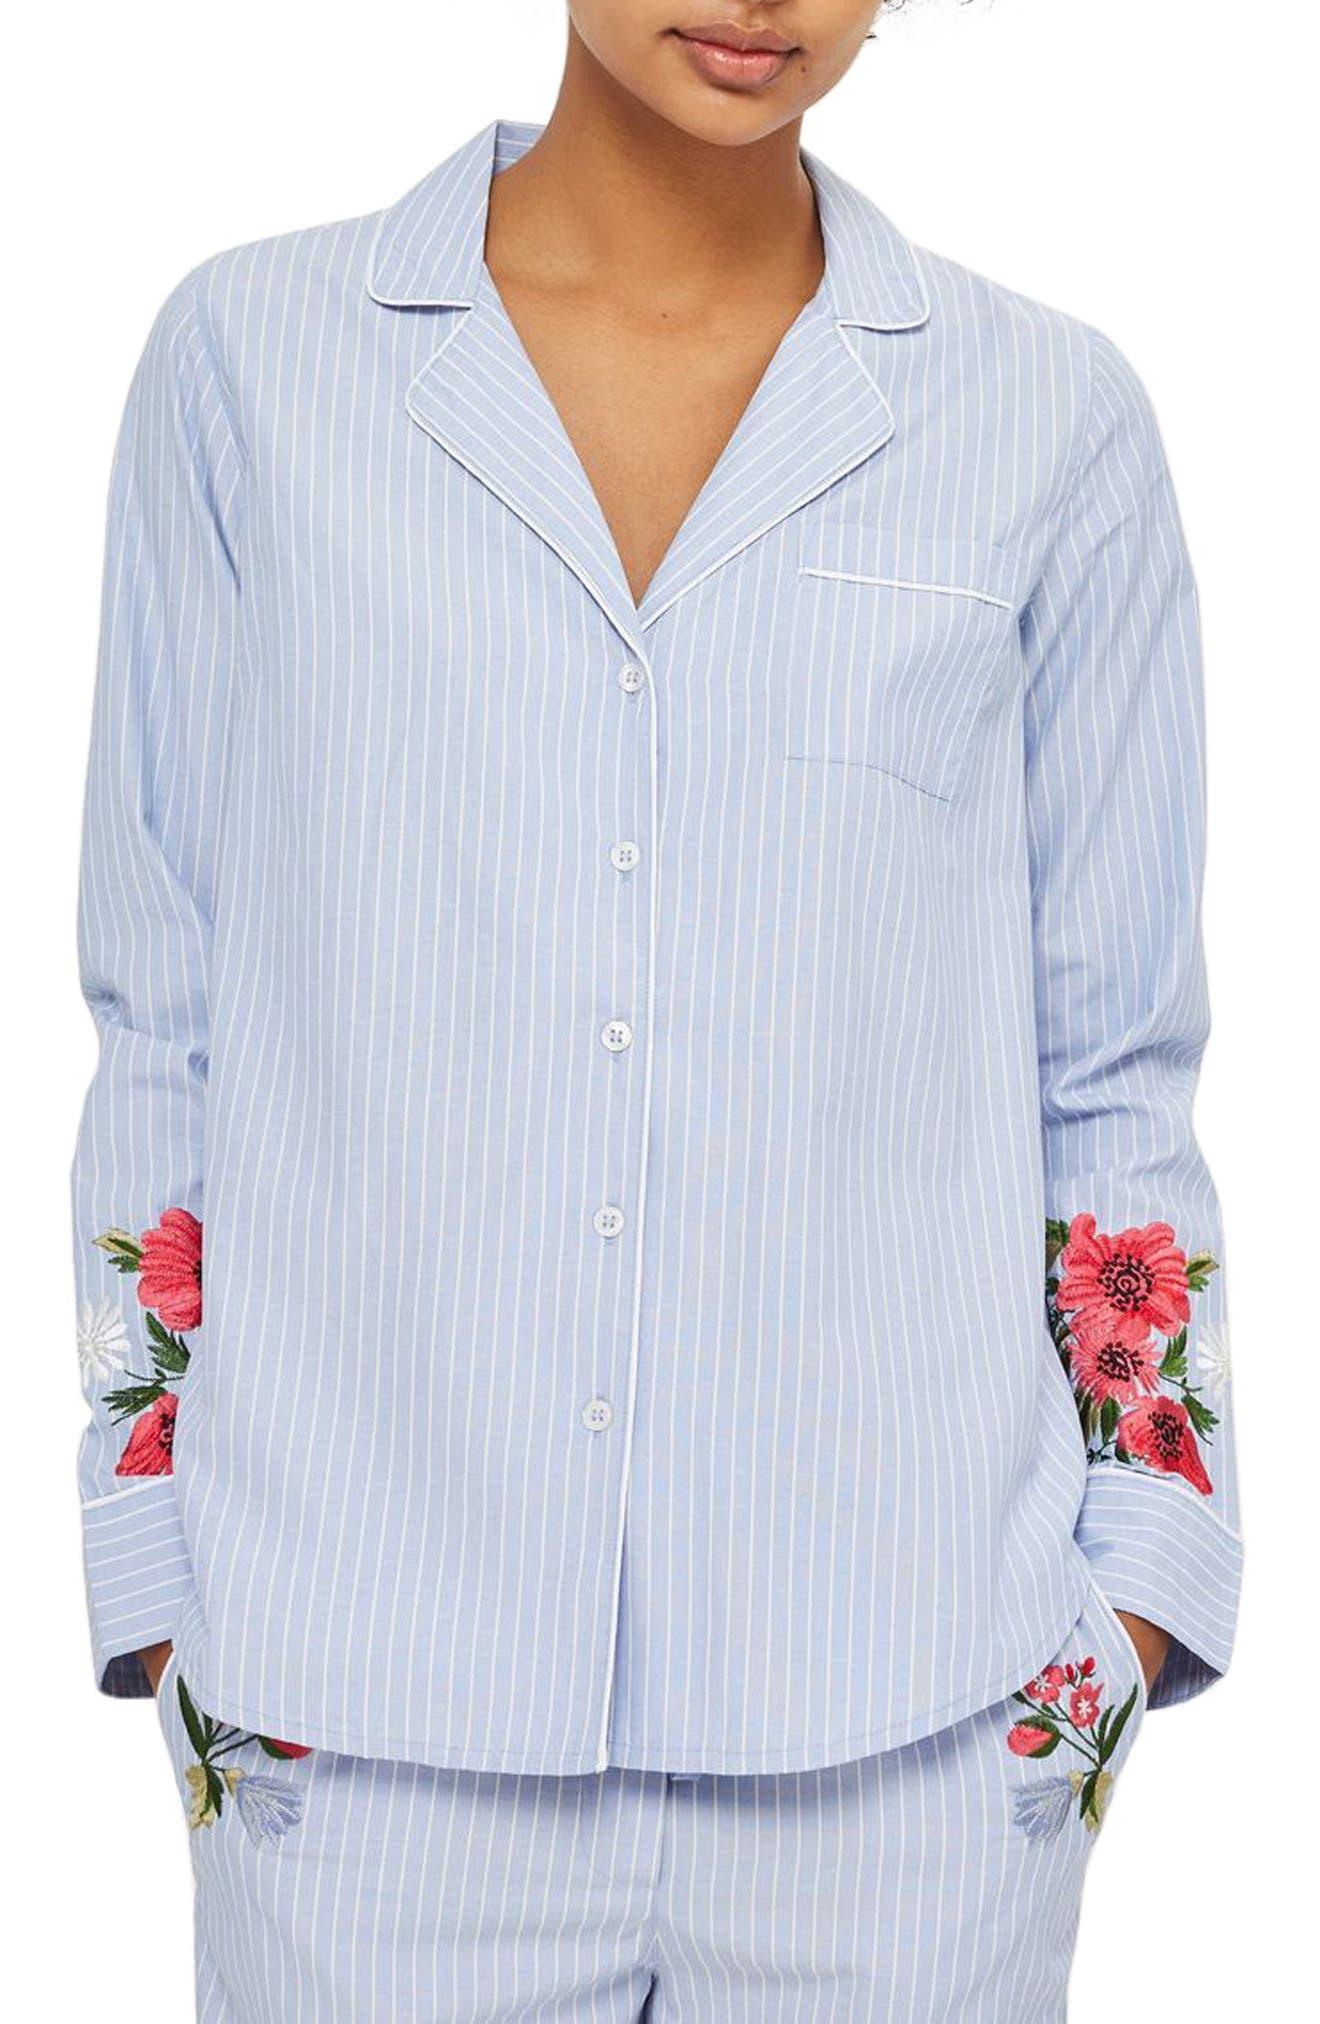 Main Image - Topshop Floral Embroidered Stripe Nightshirt